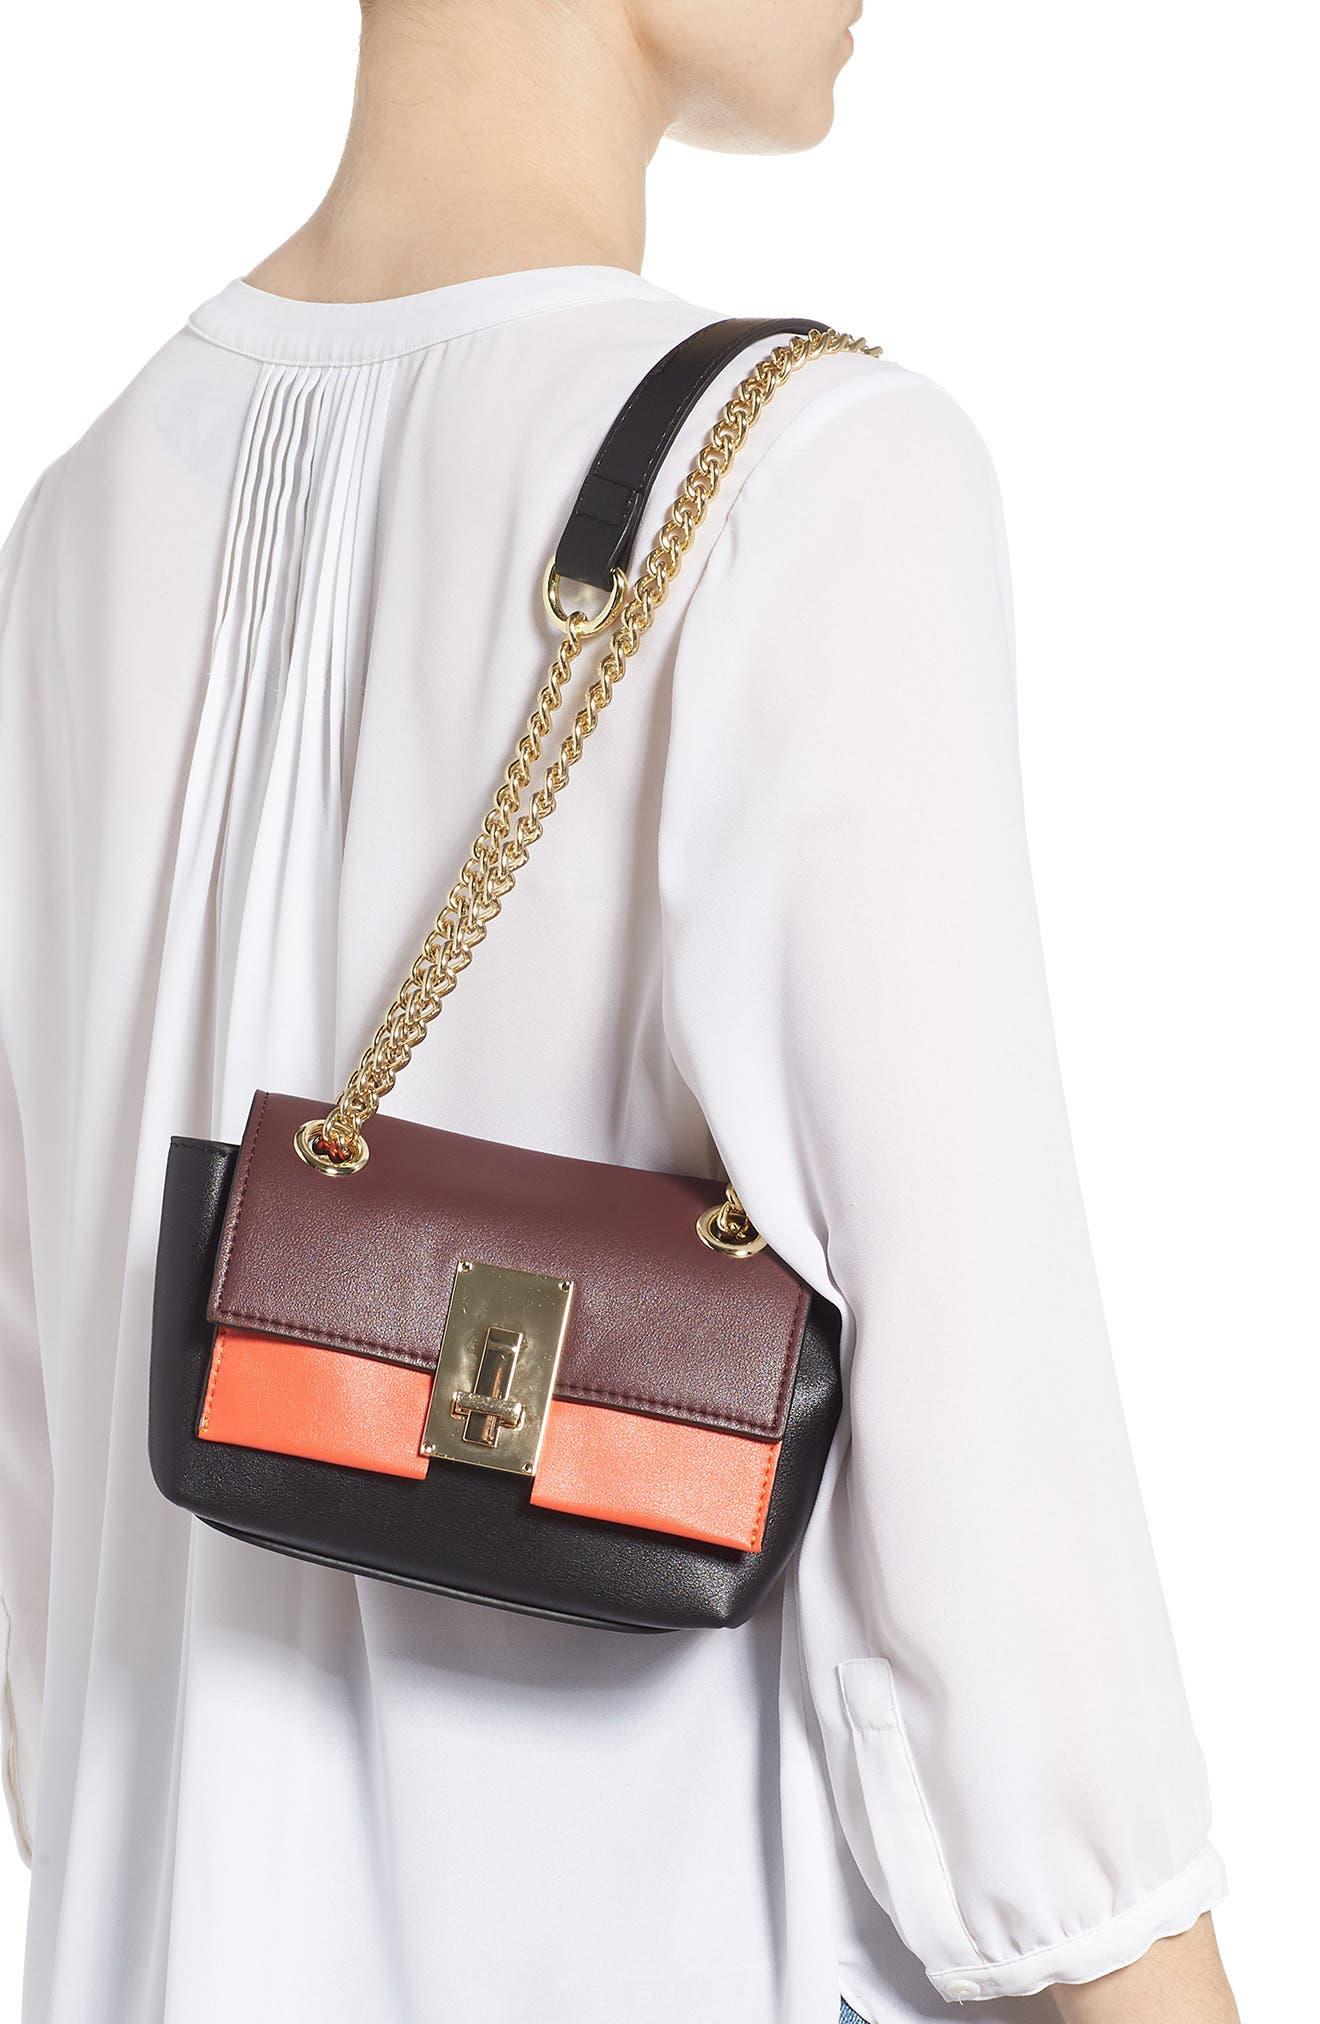 SR Squared by Sondra Roberts Colorblock Handbag,                             Alternate thumbnail 3, color,                             MULTI COMBO